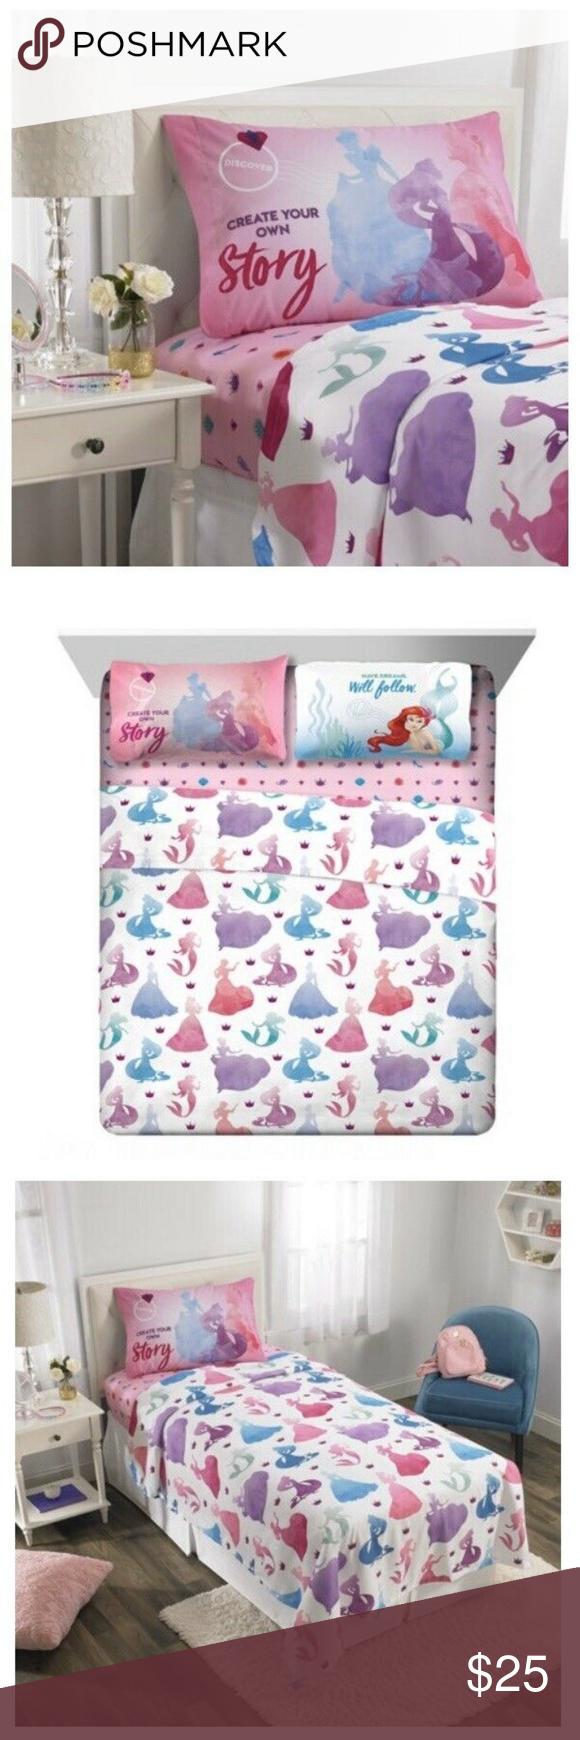 Disney Princess Full Size 4 Piece Bedding Sheets Disney Princess Full Size 4 Pie…